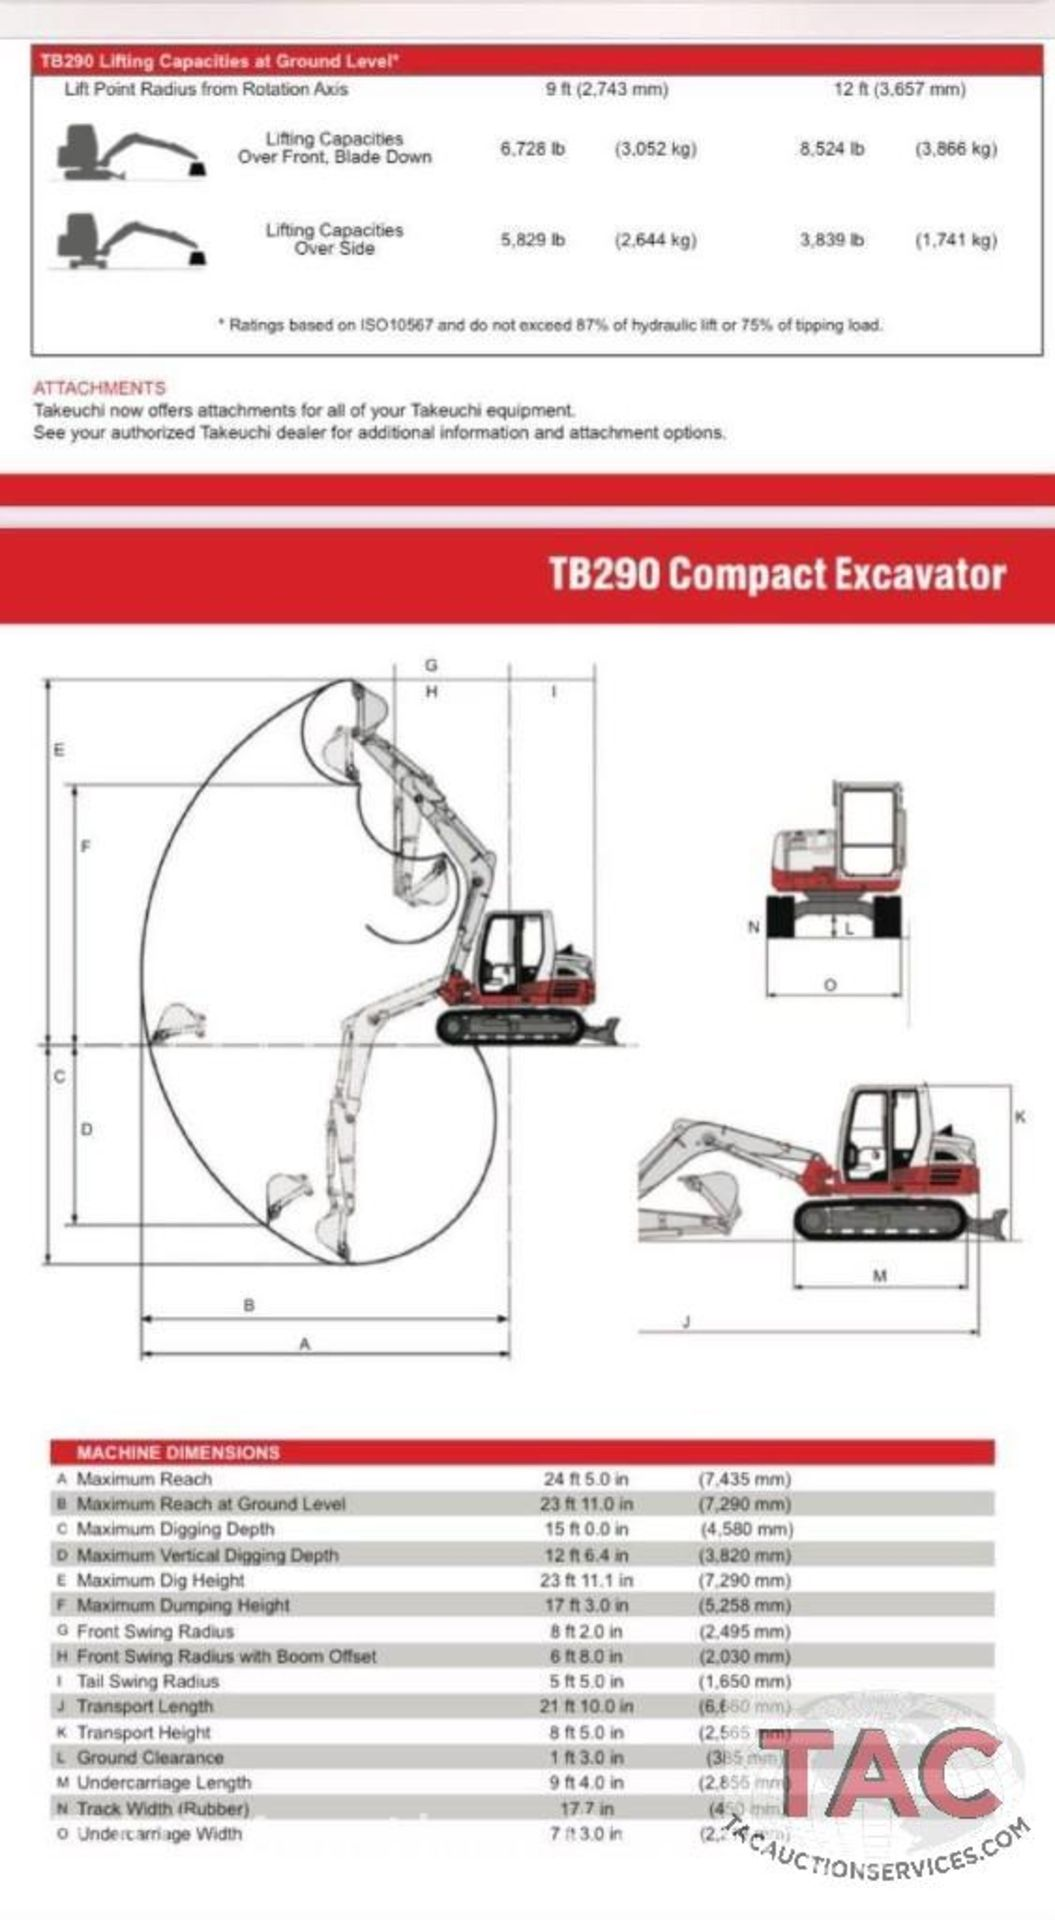 2017 Takeuchi TB290 Excavator - Image 45 of 45